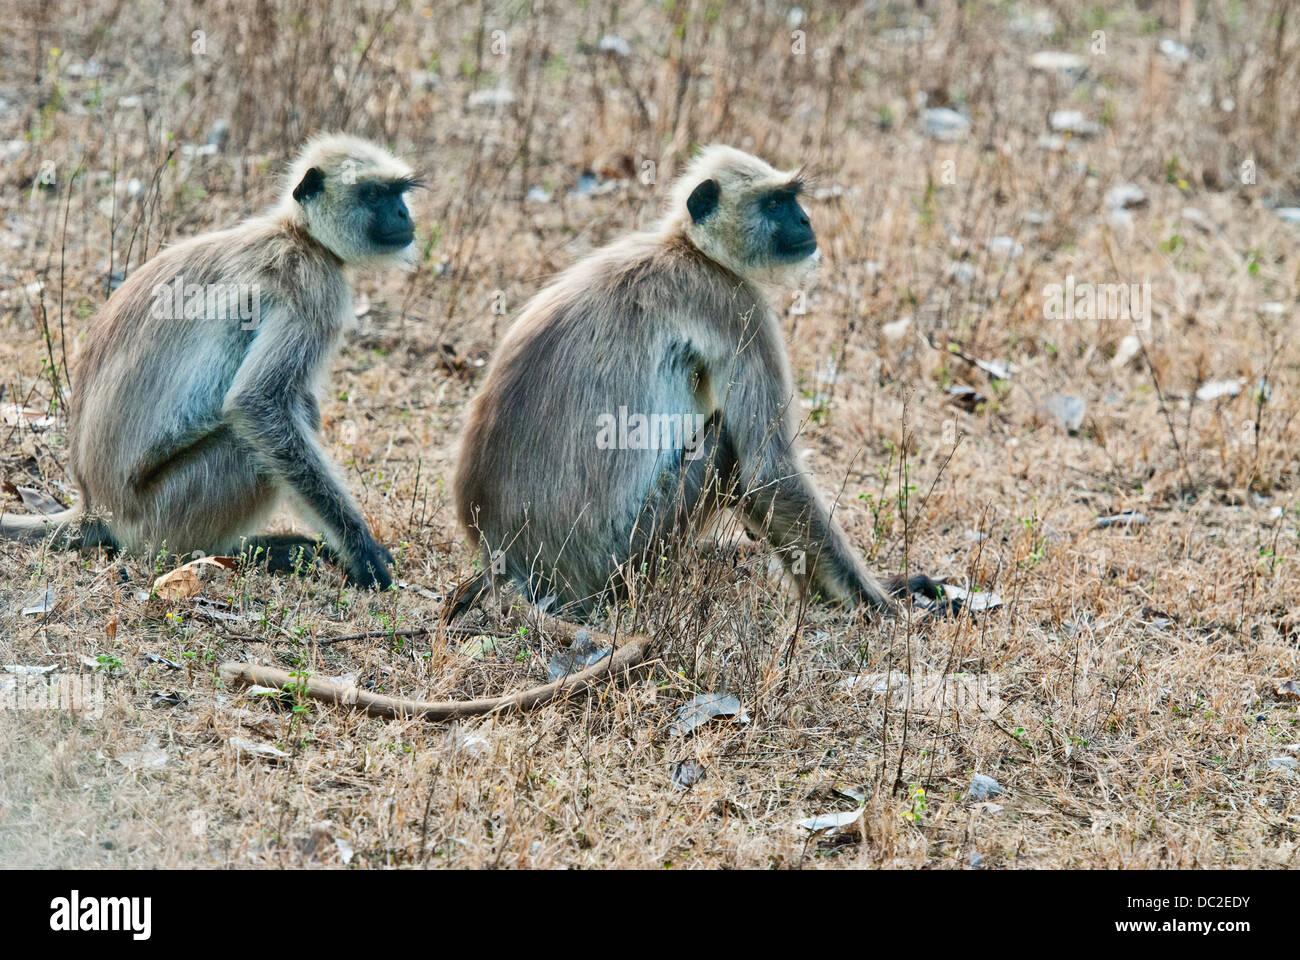 Black-faced Langur monkeys in Bandhavgarh National Park, India - Stock Image